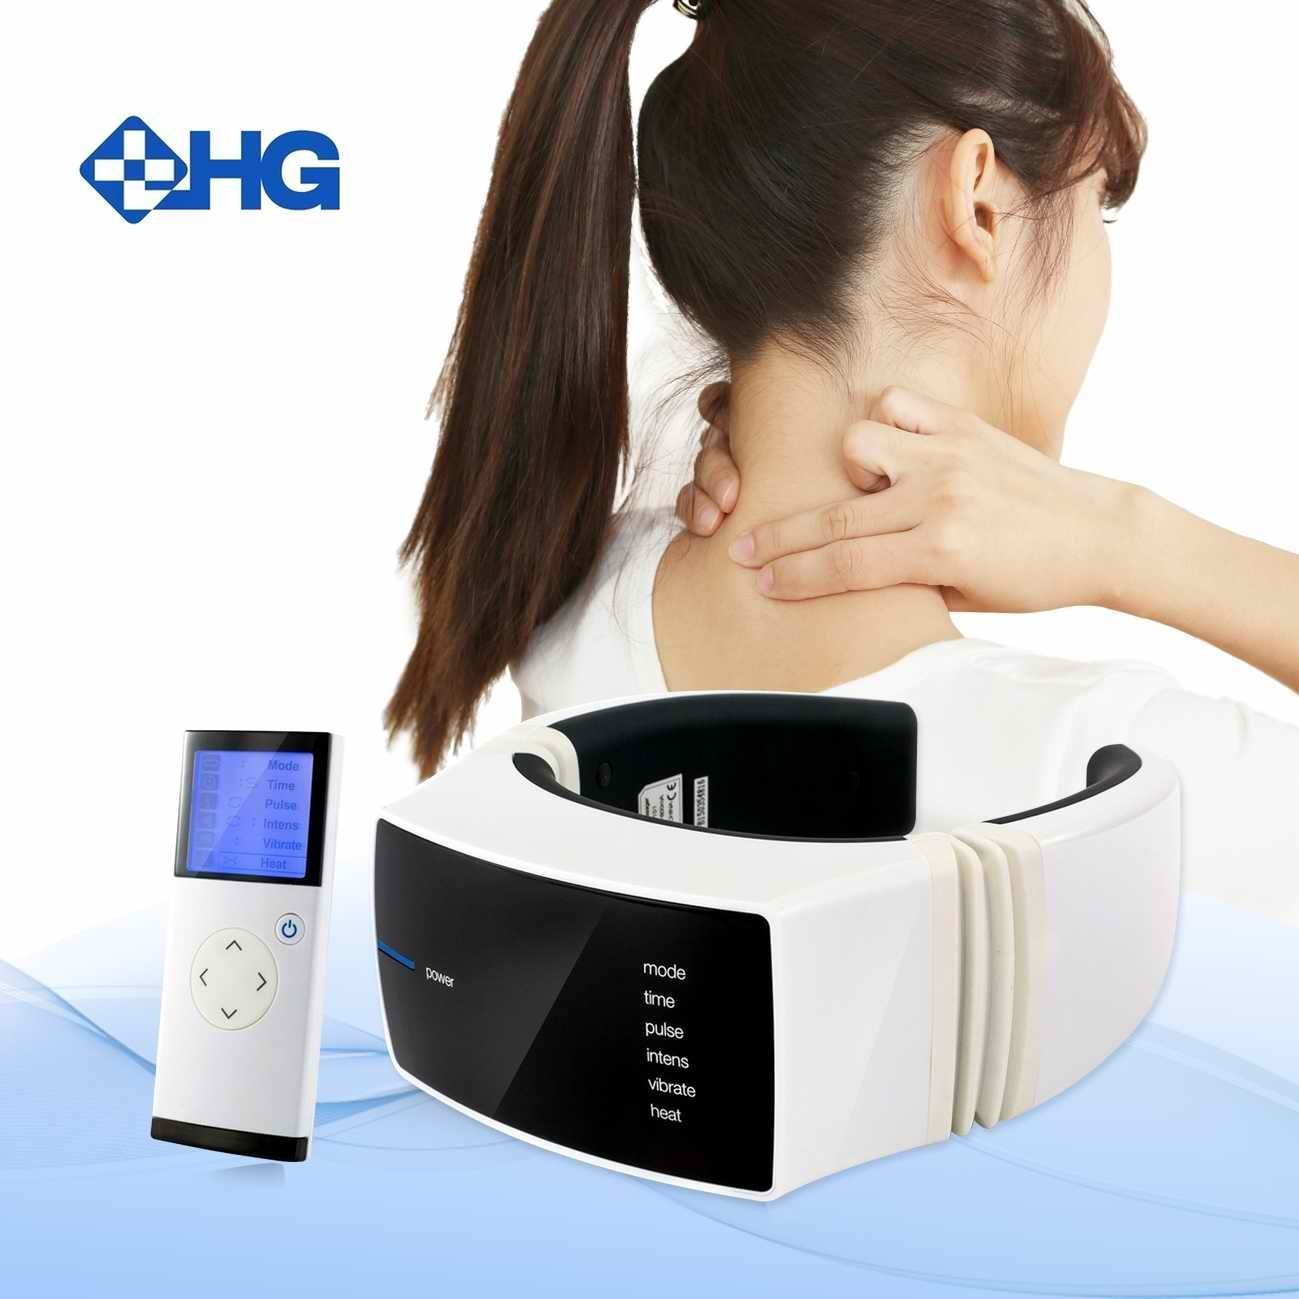 U-neck Nackenmassagegerät